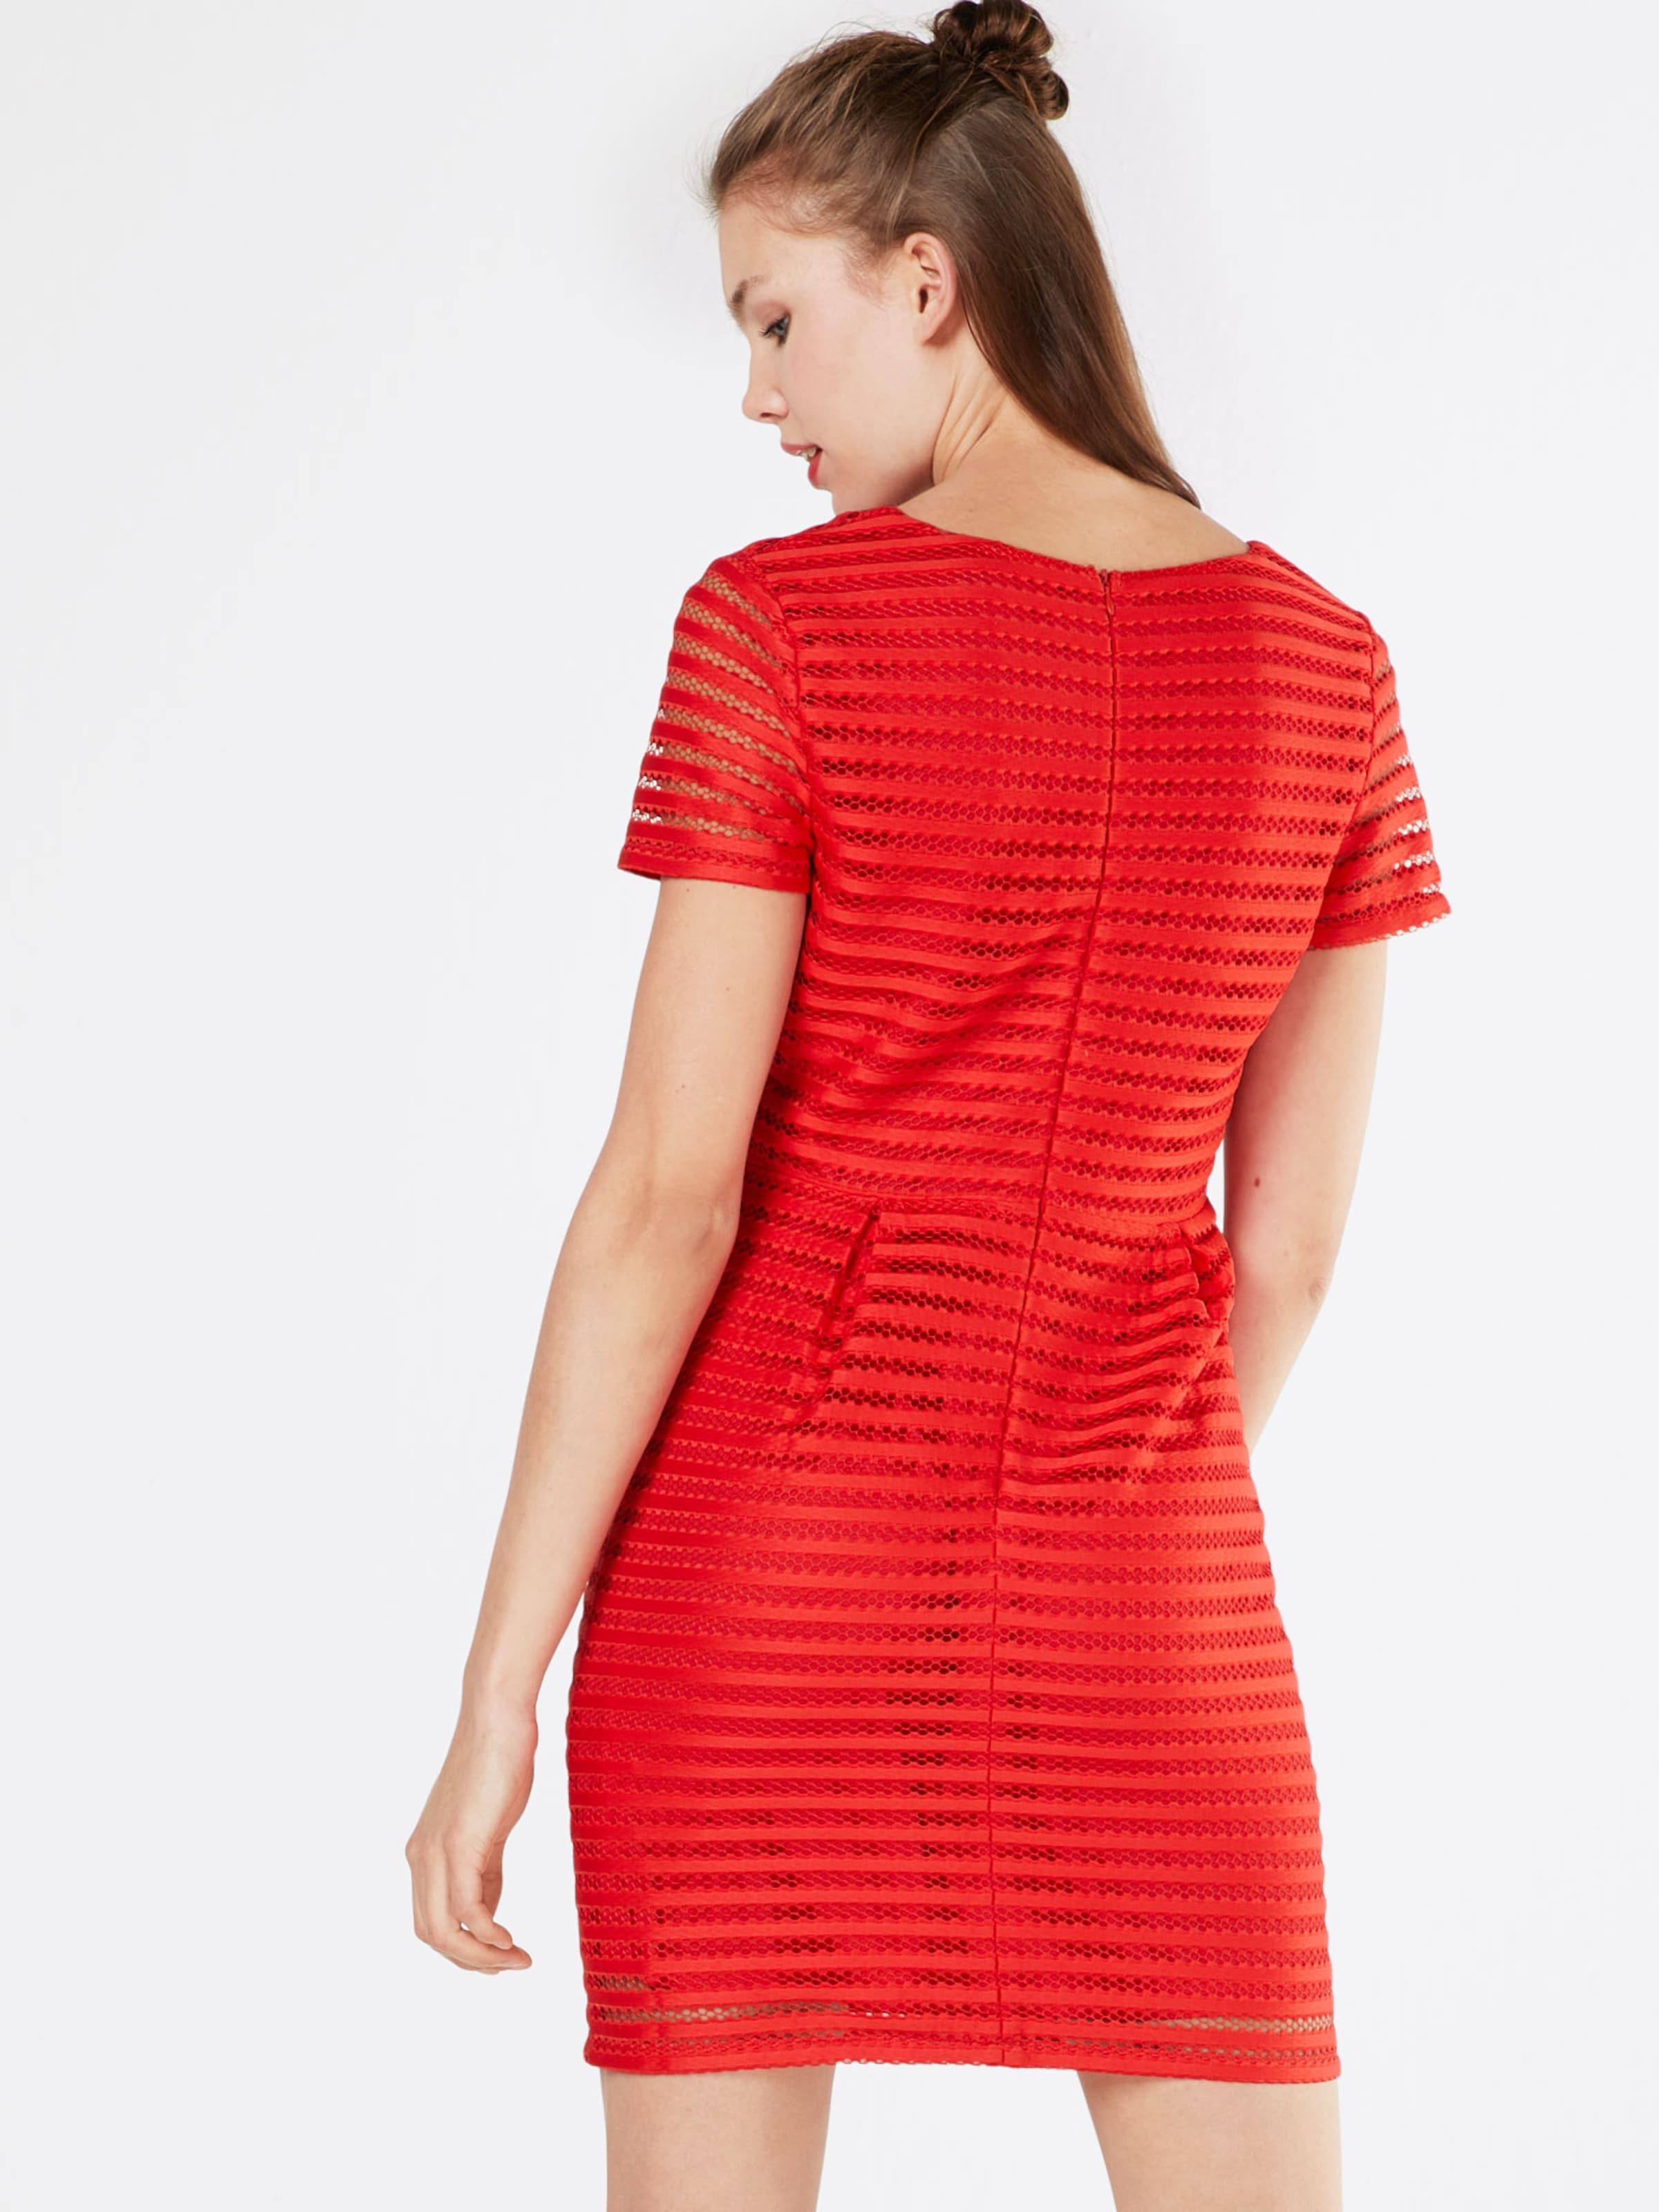 Kleid Pannelled' Boohoo In Rot 'lace n8X0NkOPw